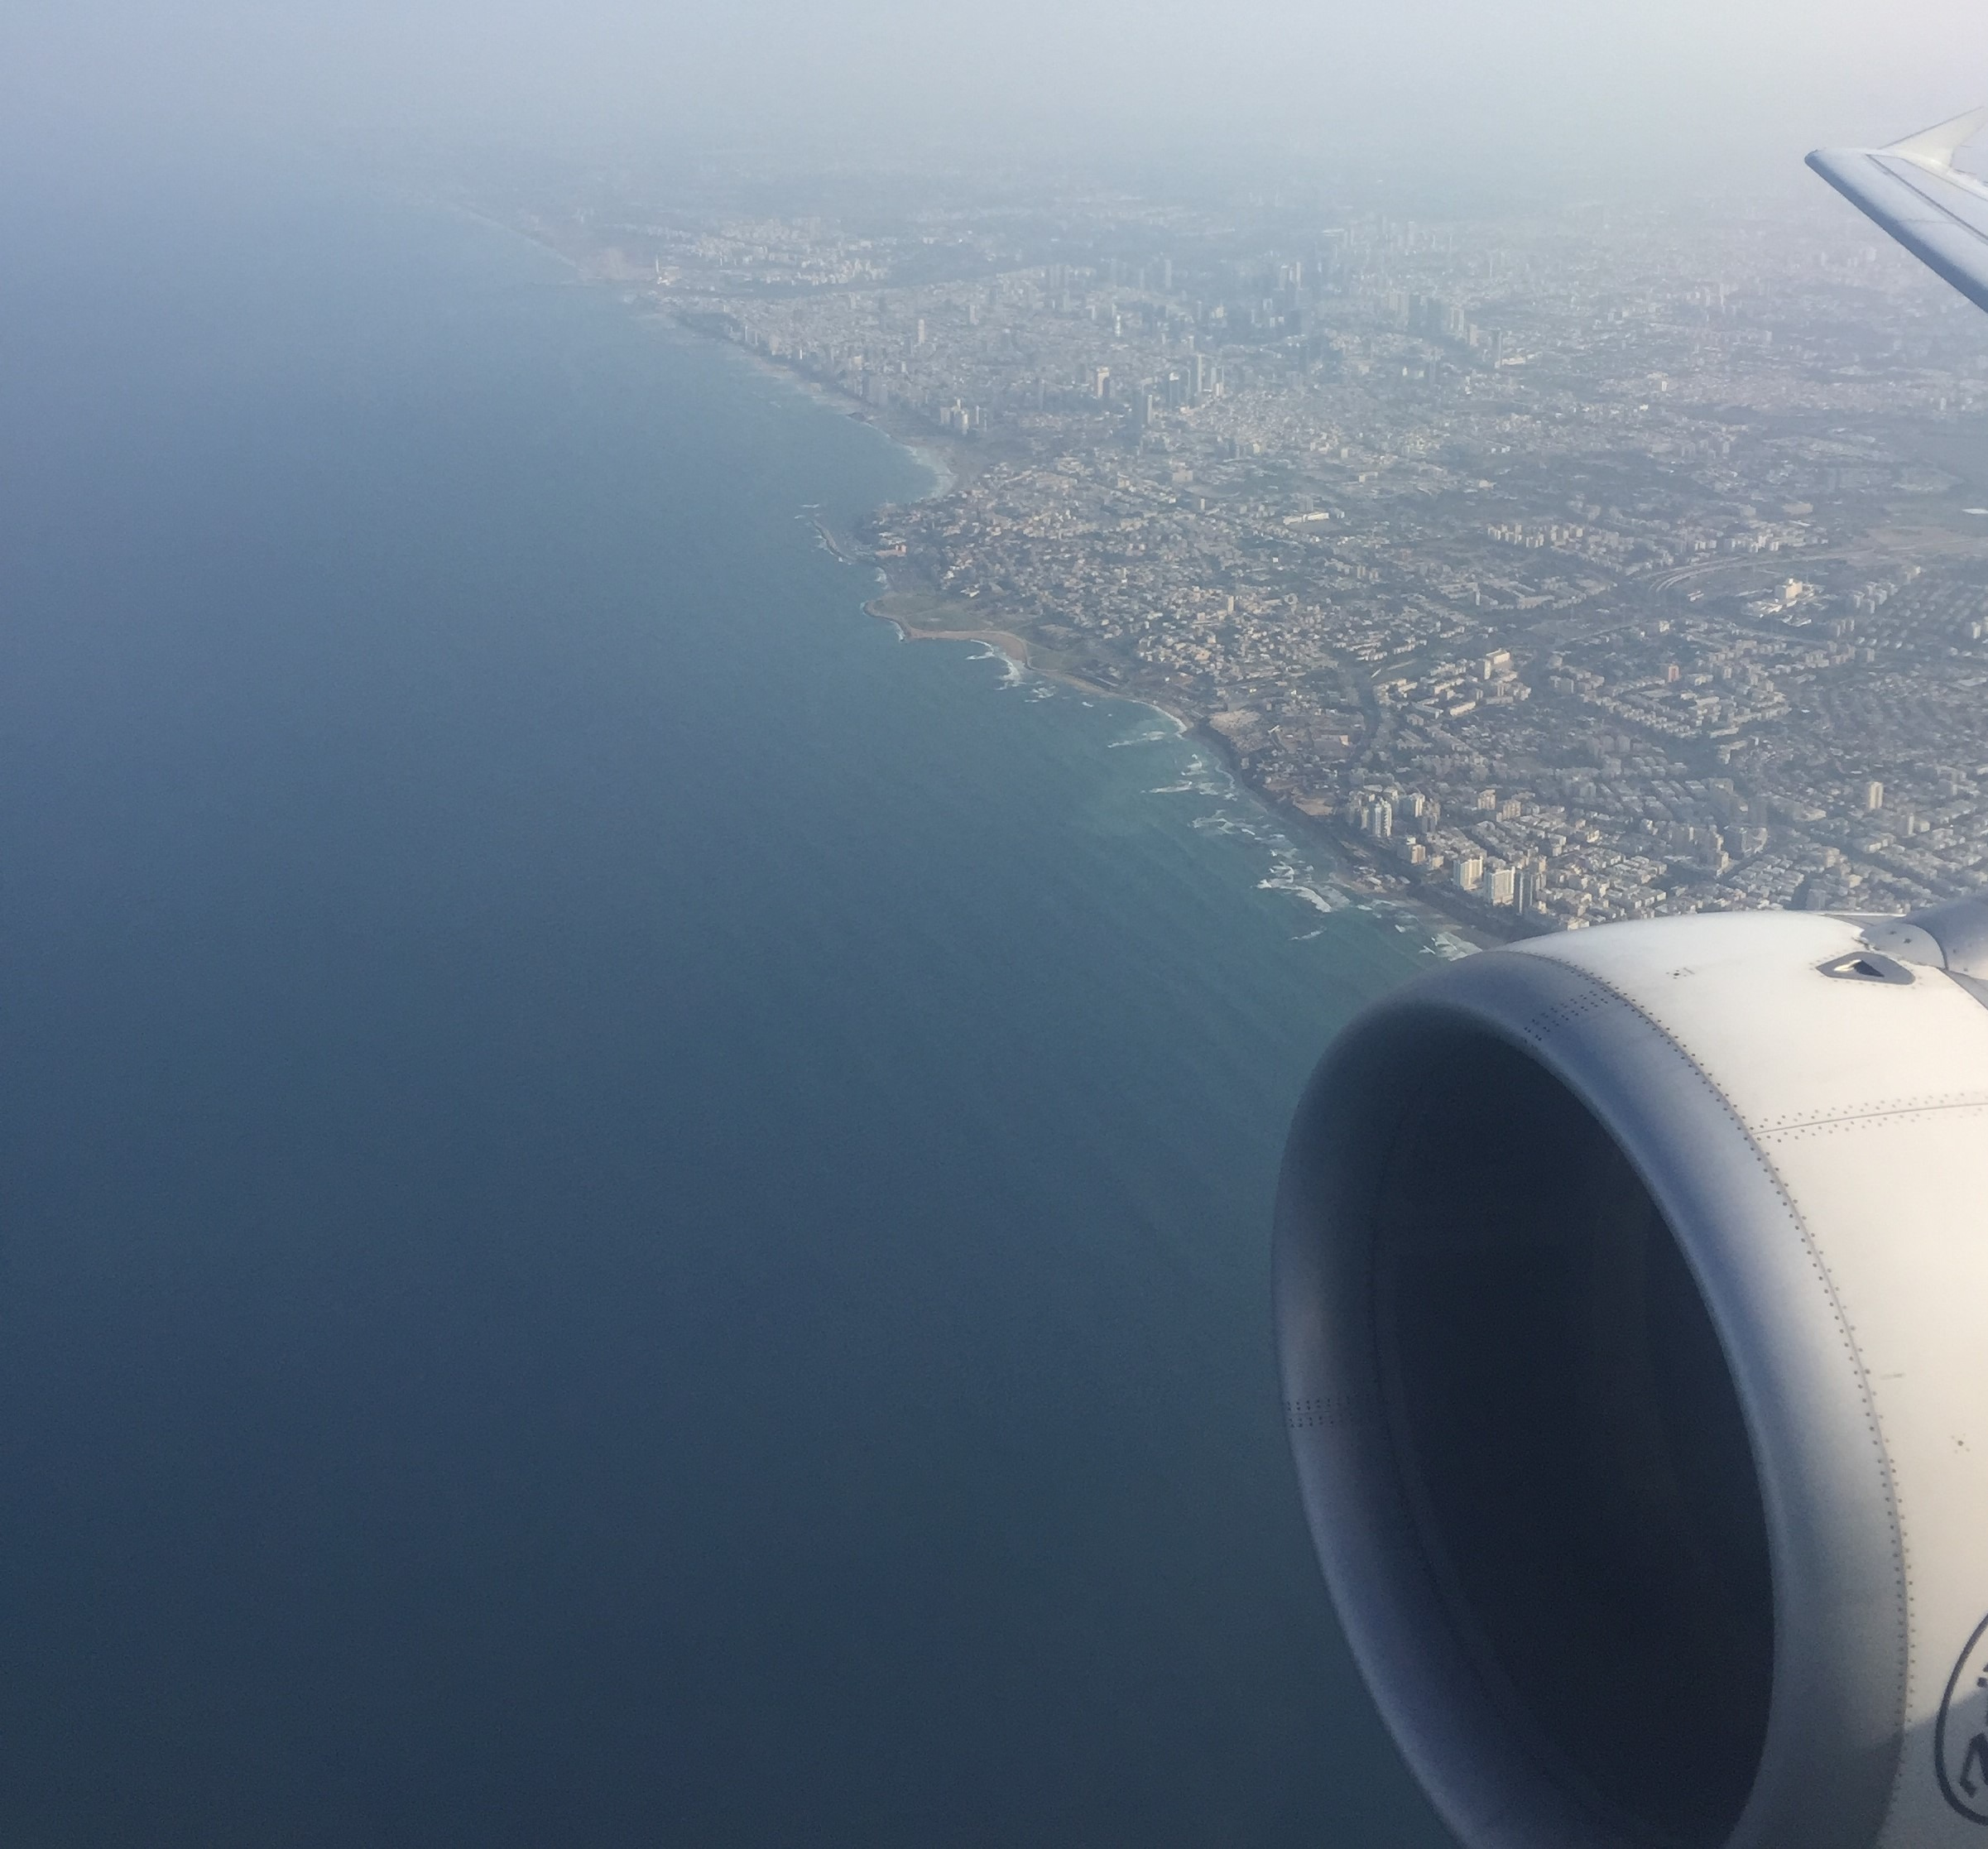 Israel coastline from airplane